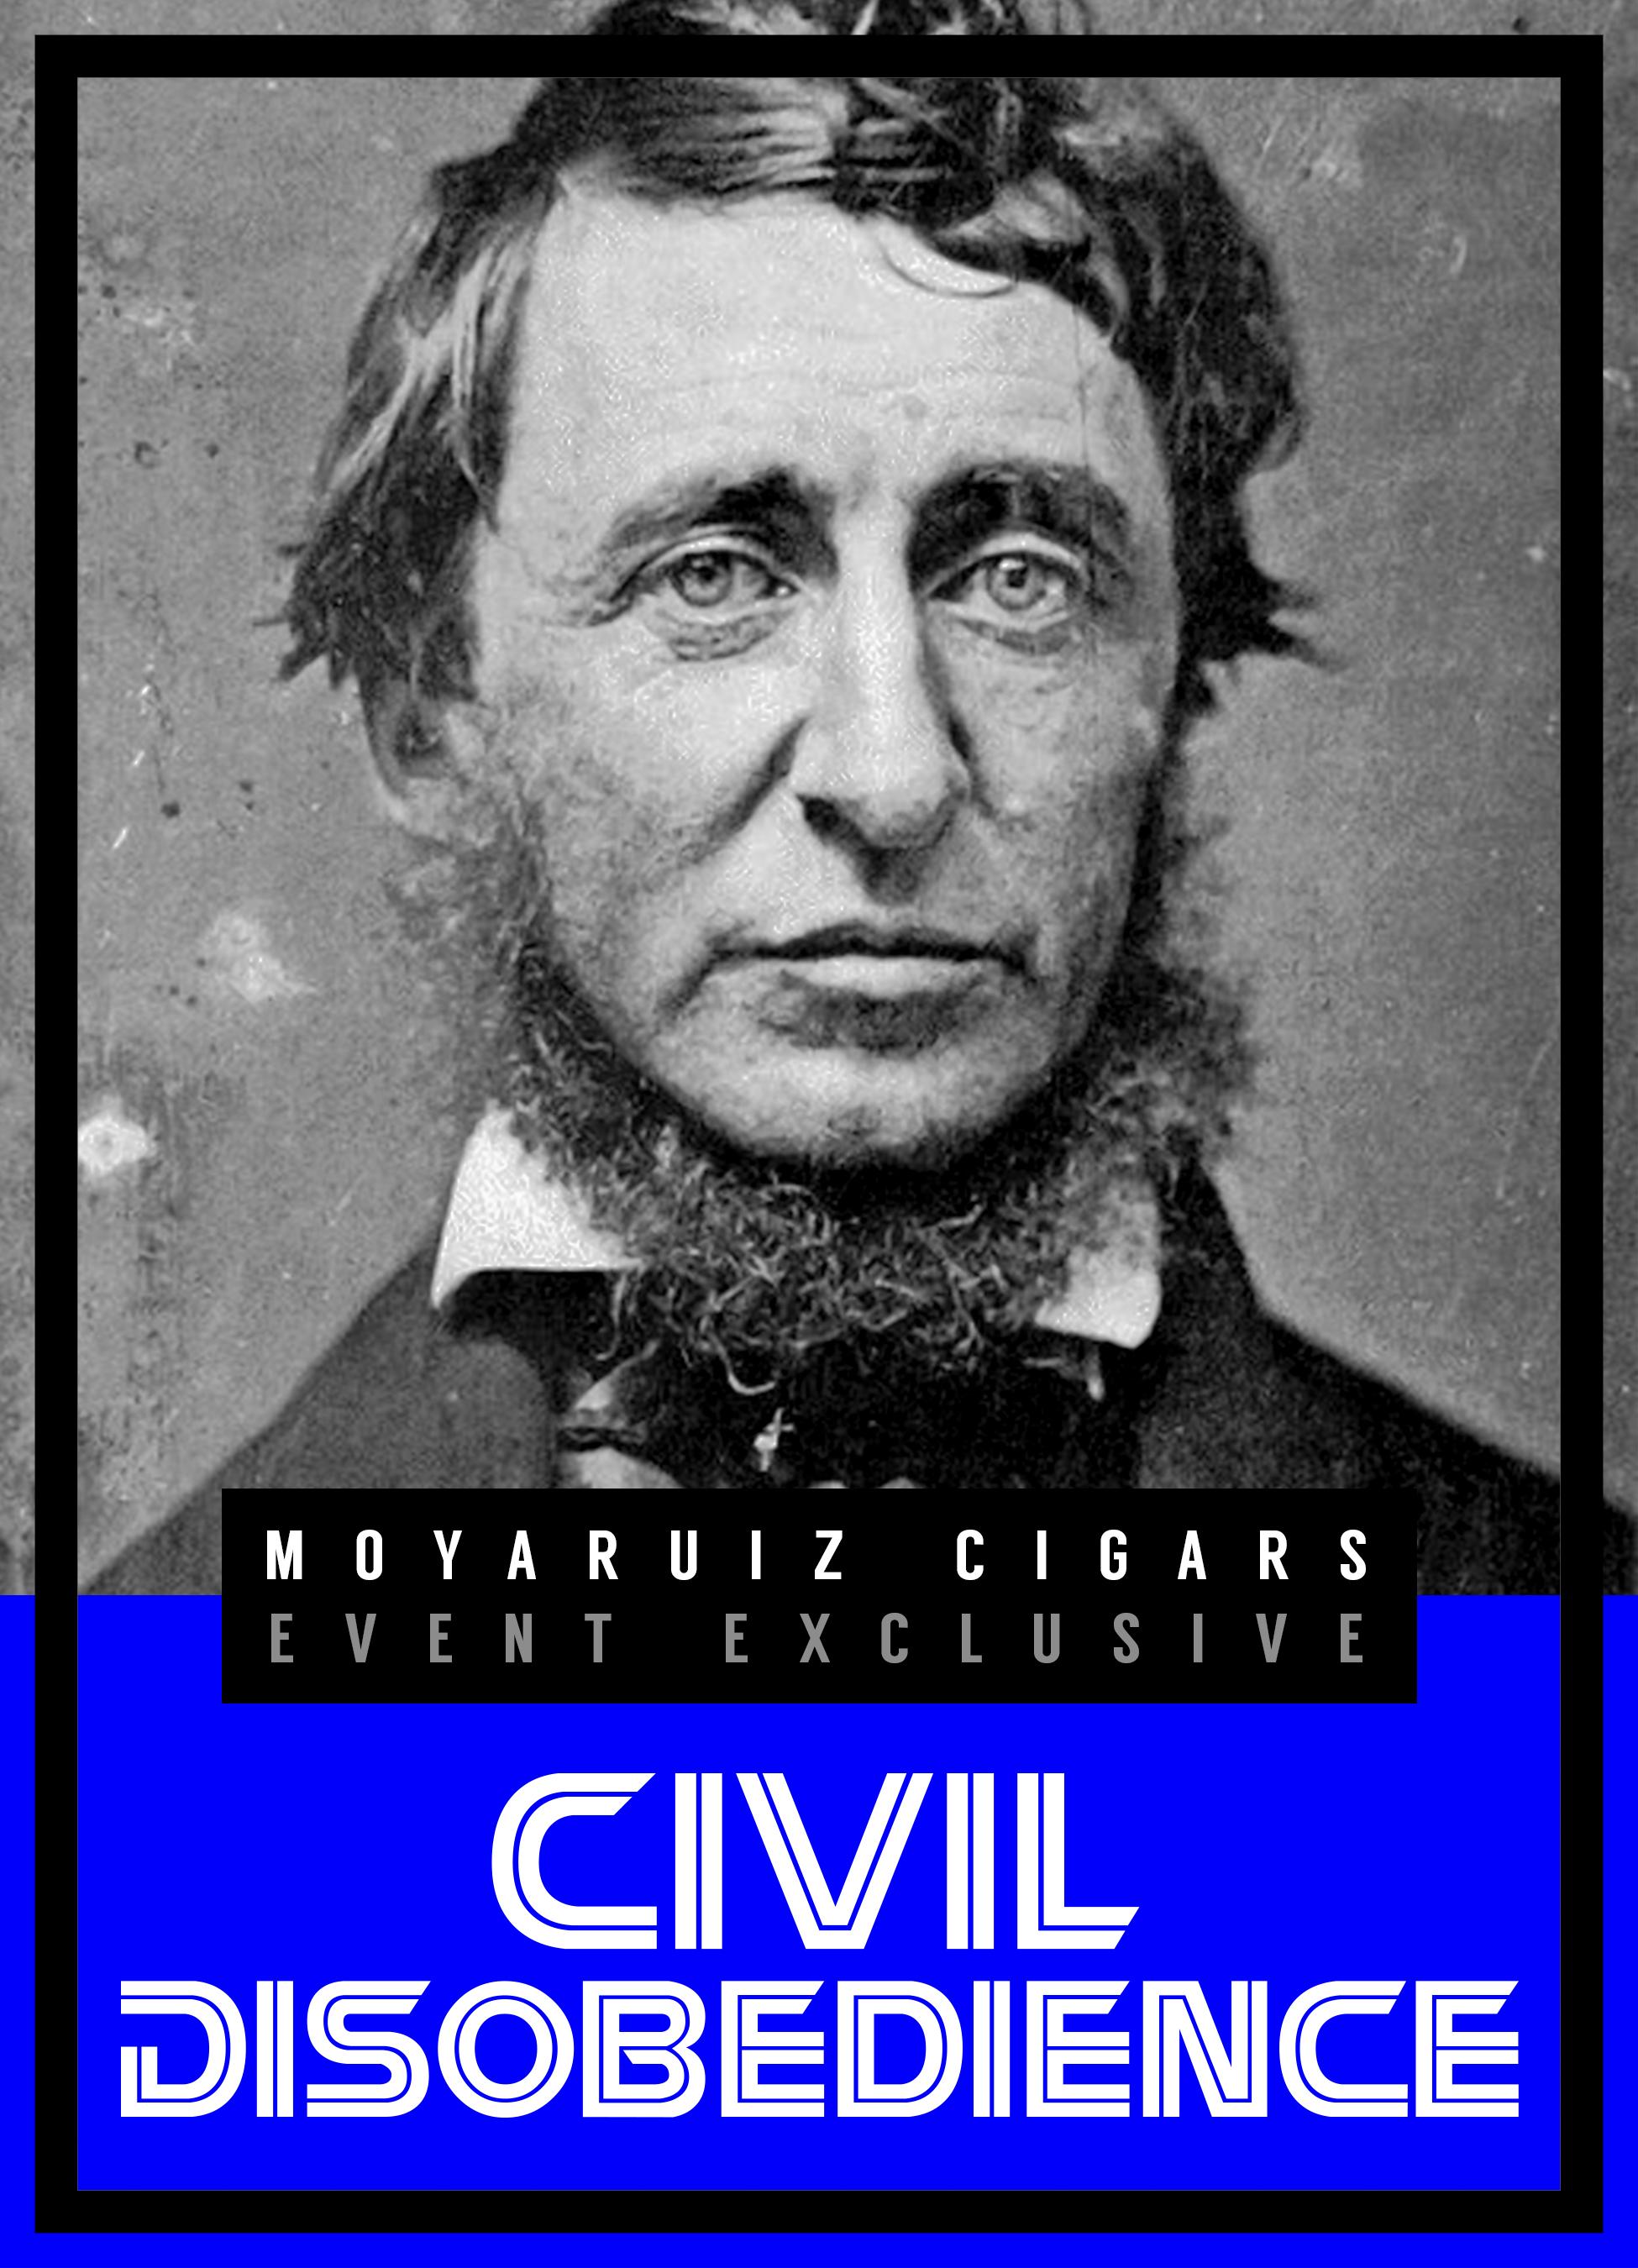 MoyaRuiz_Civil_Disobedience,jpg